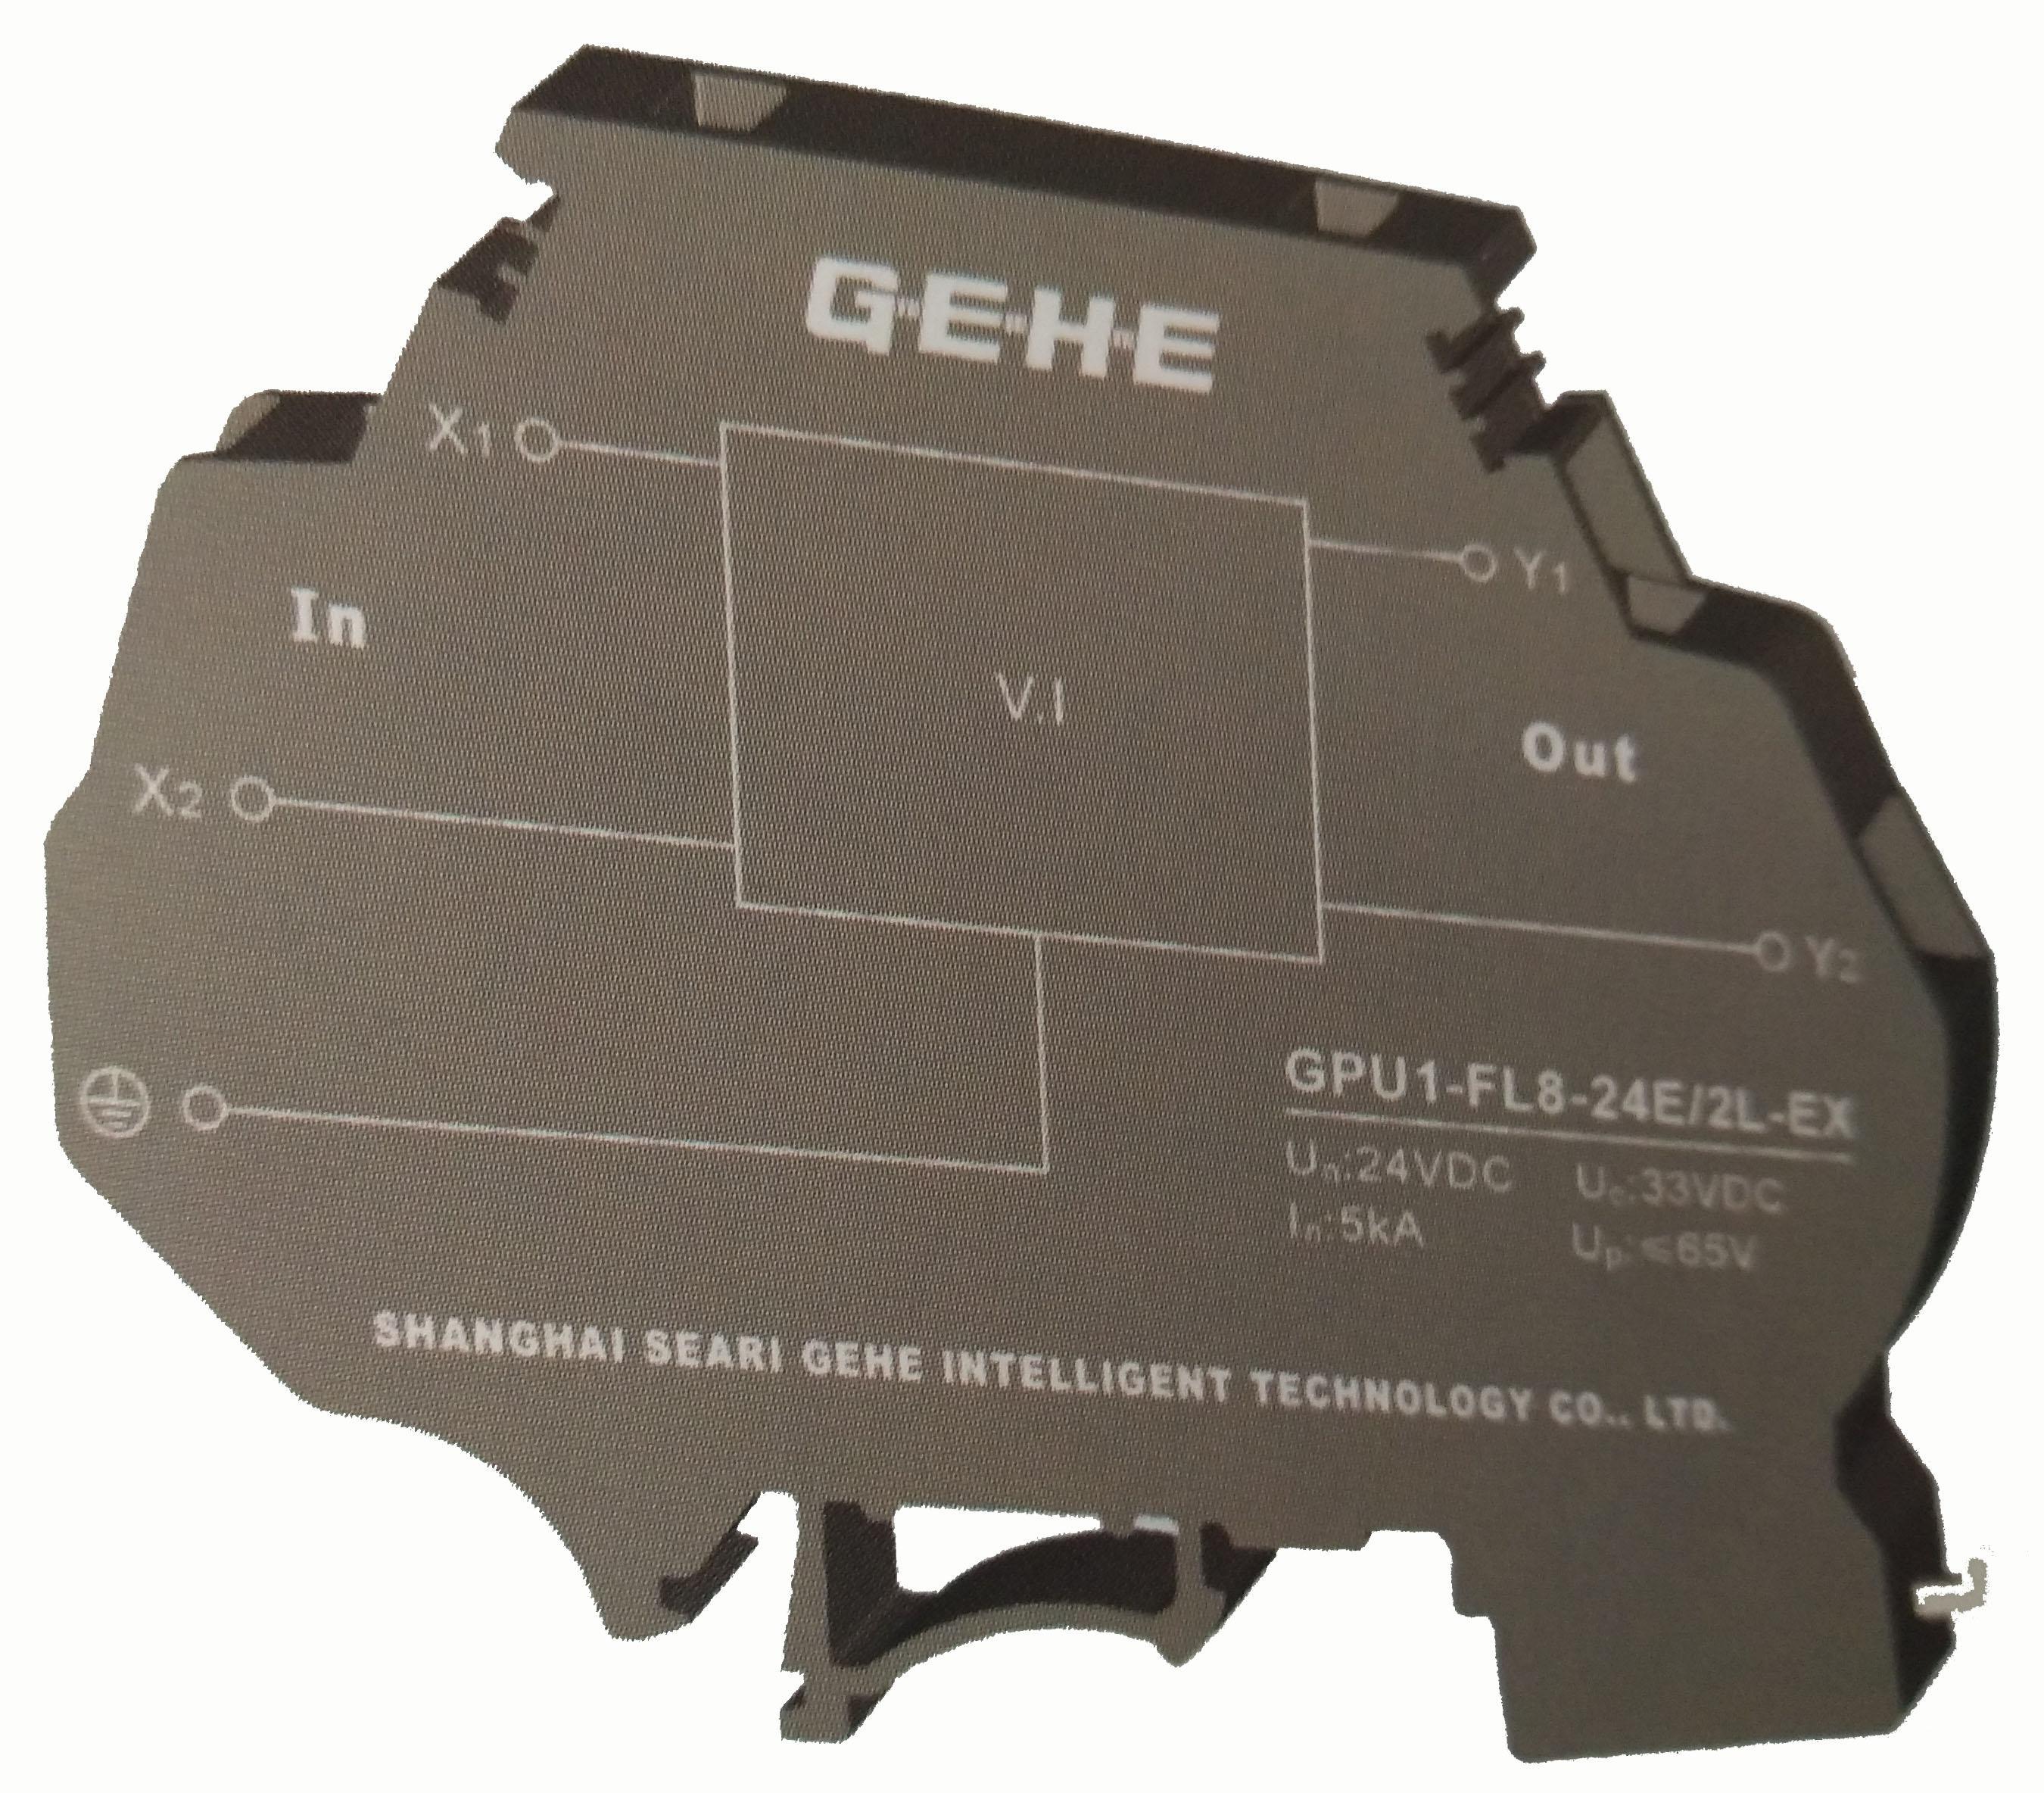 24E GPU1-FL8/2L-EX系列信号千赢app客户端下载器